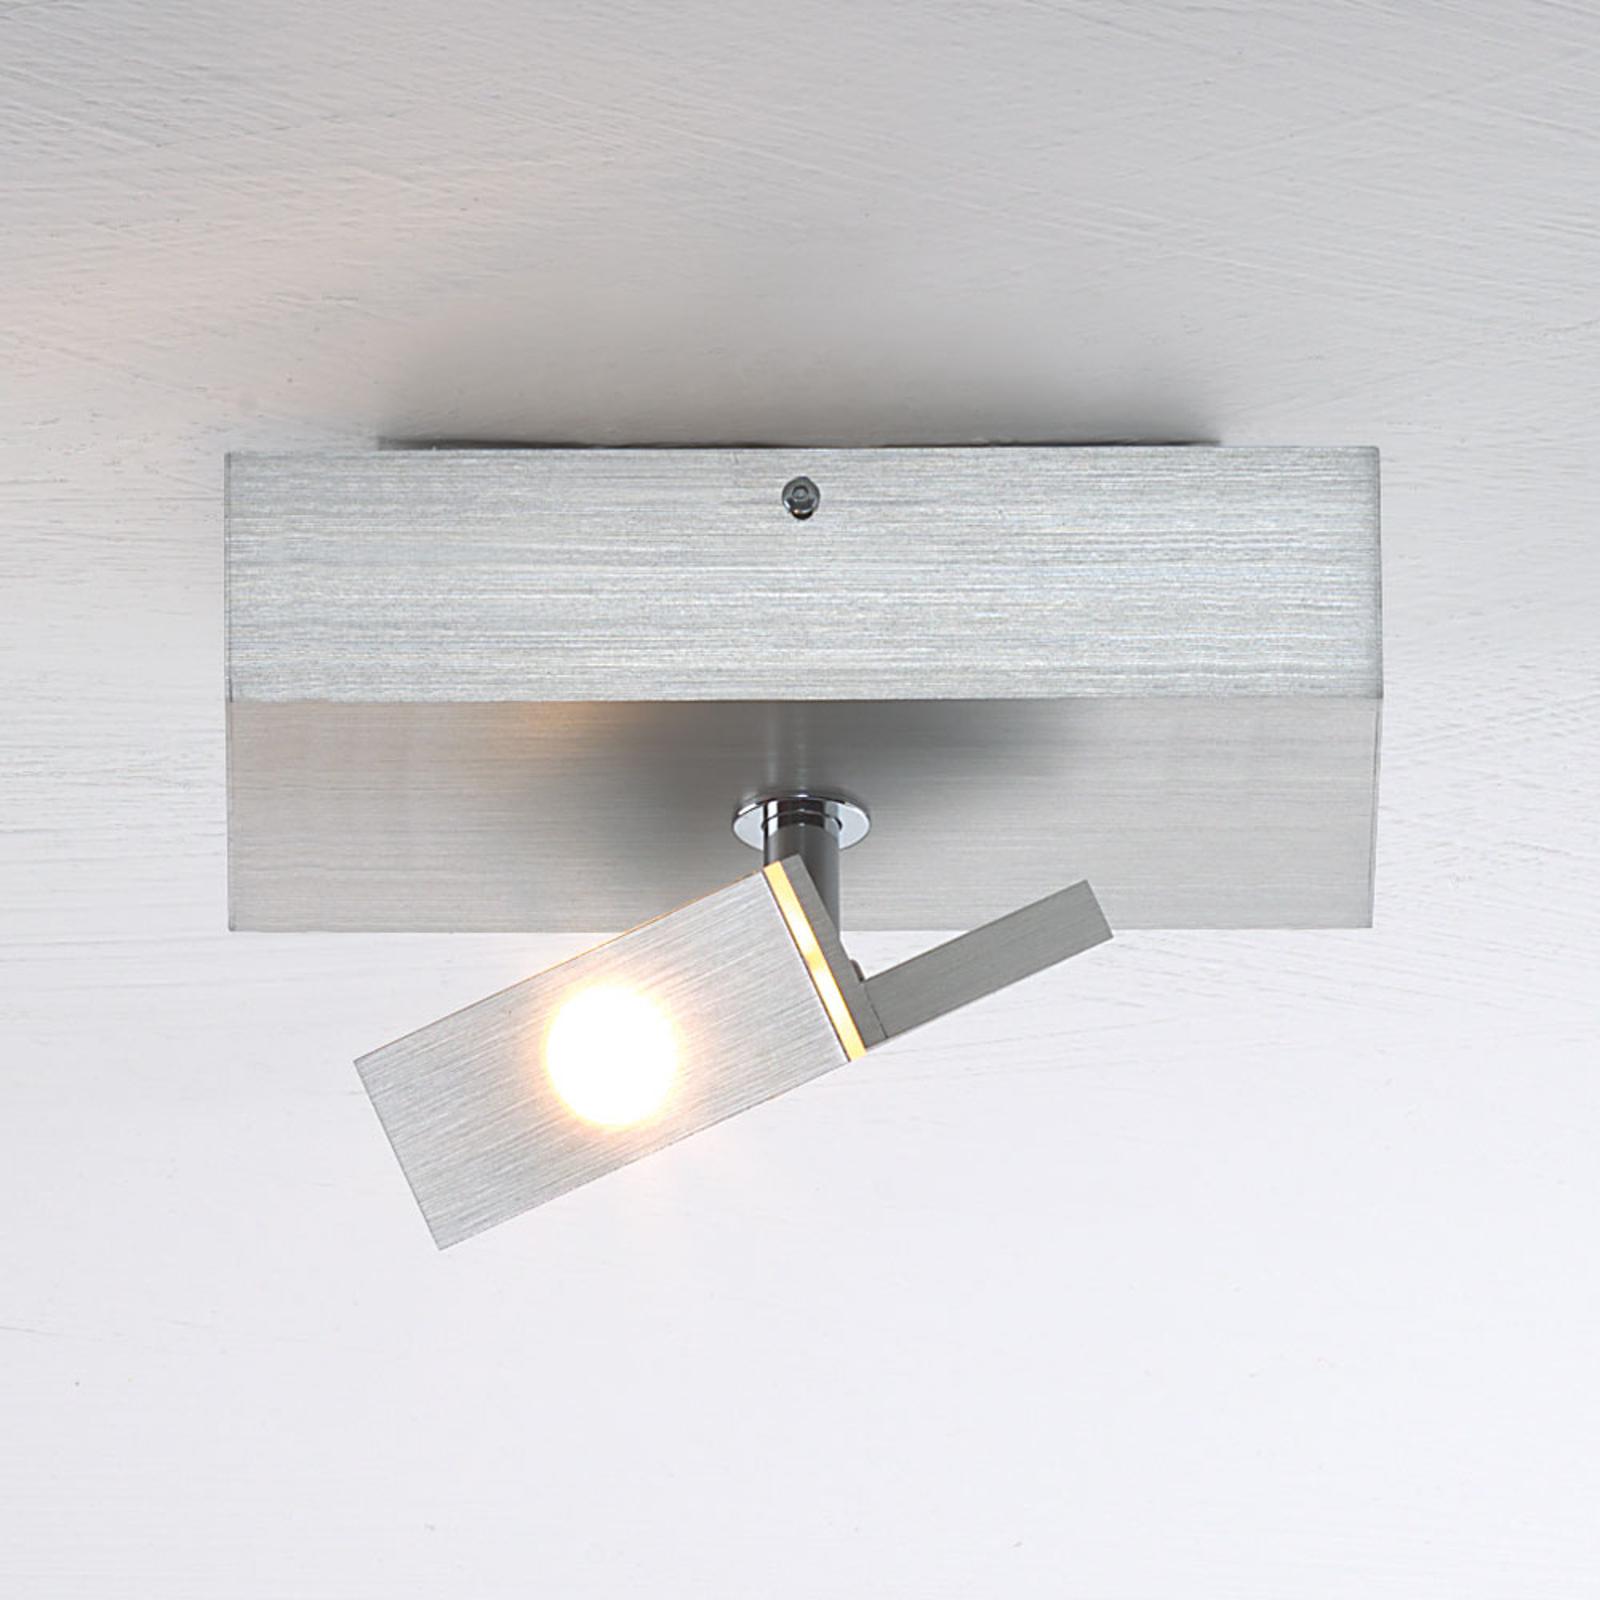 Lille LED-loftspot Elle, kan vippes og dæmpes